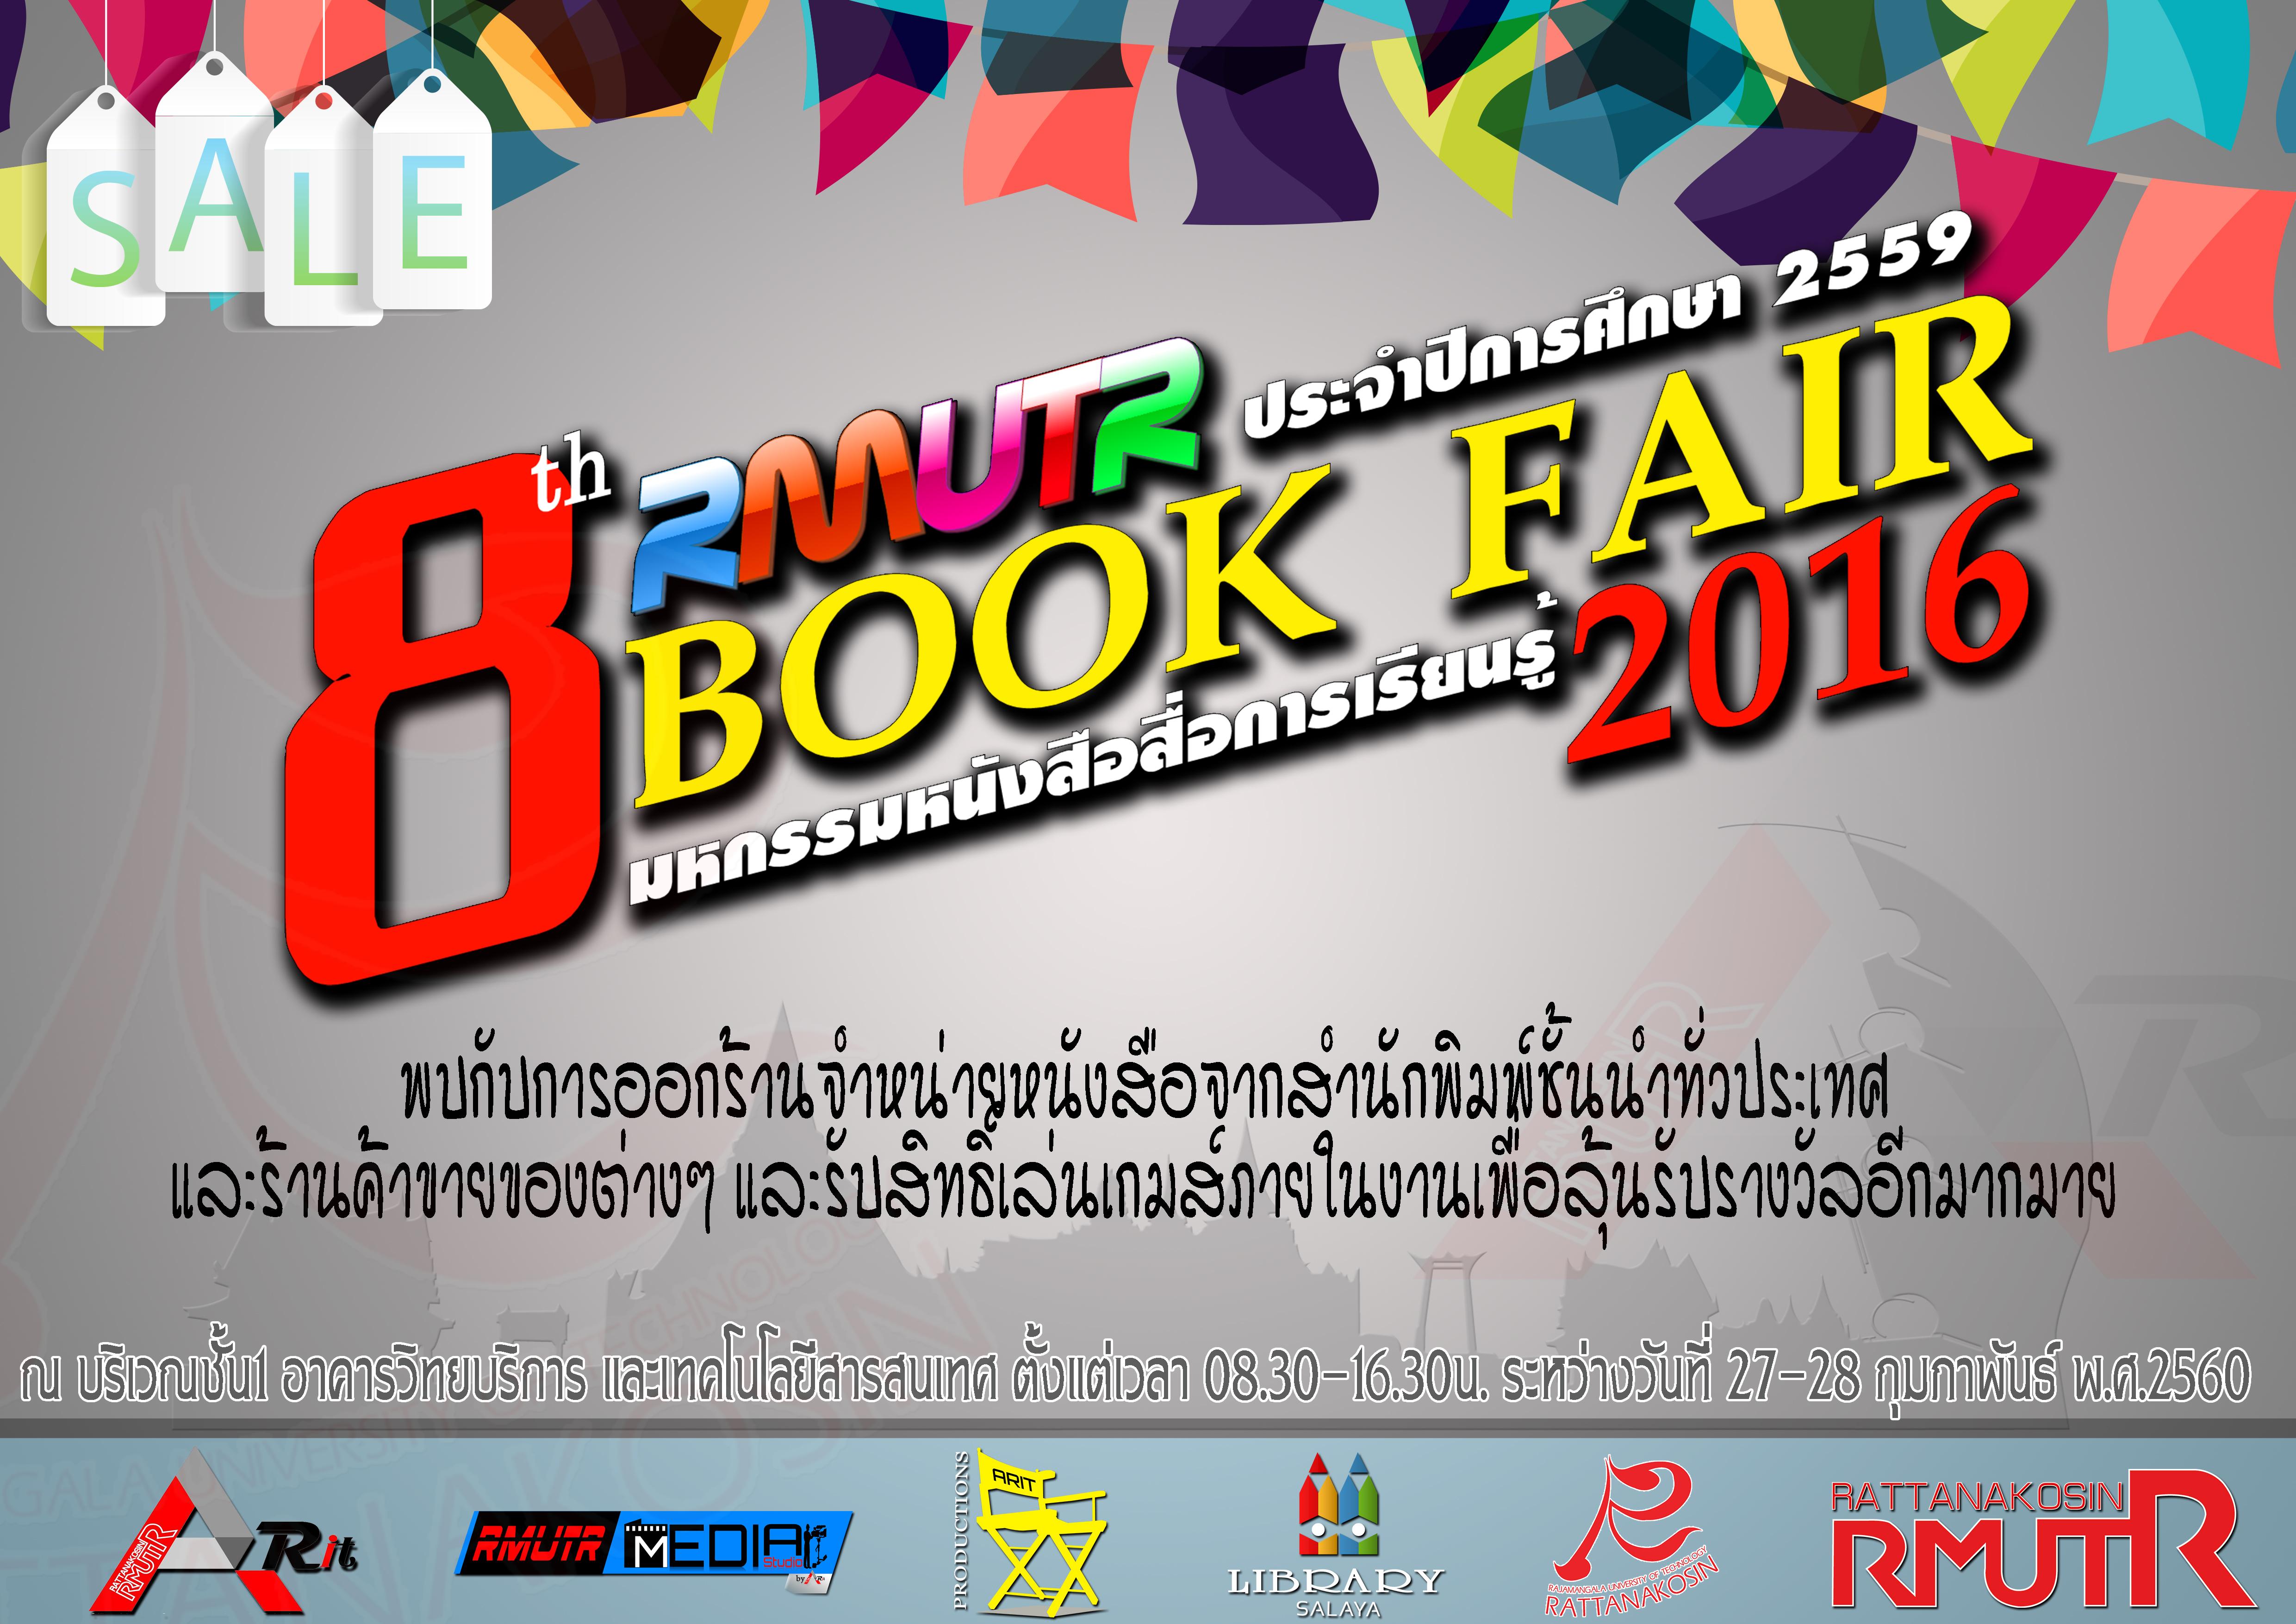 Rmutr_Bookfair2016